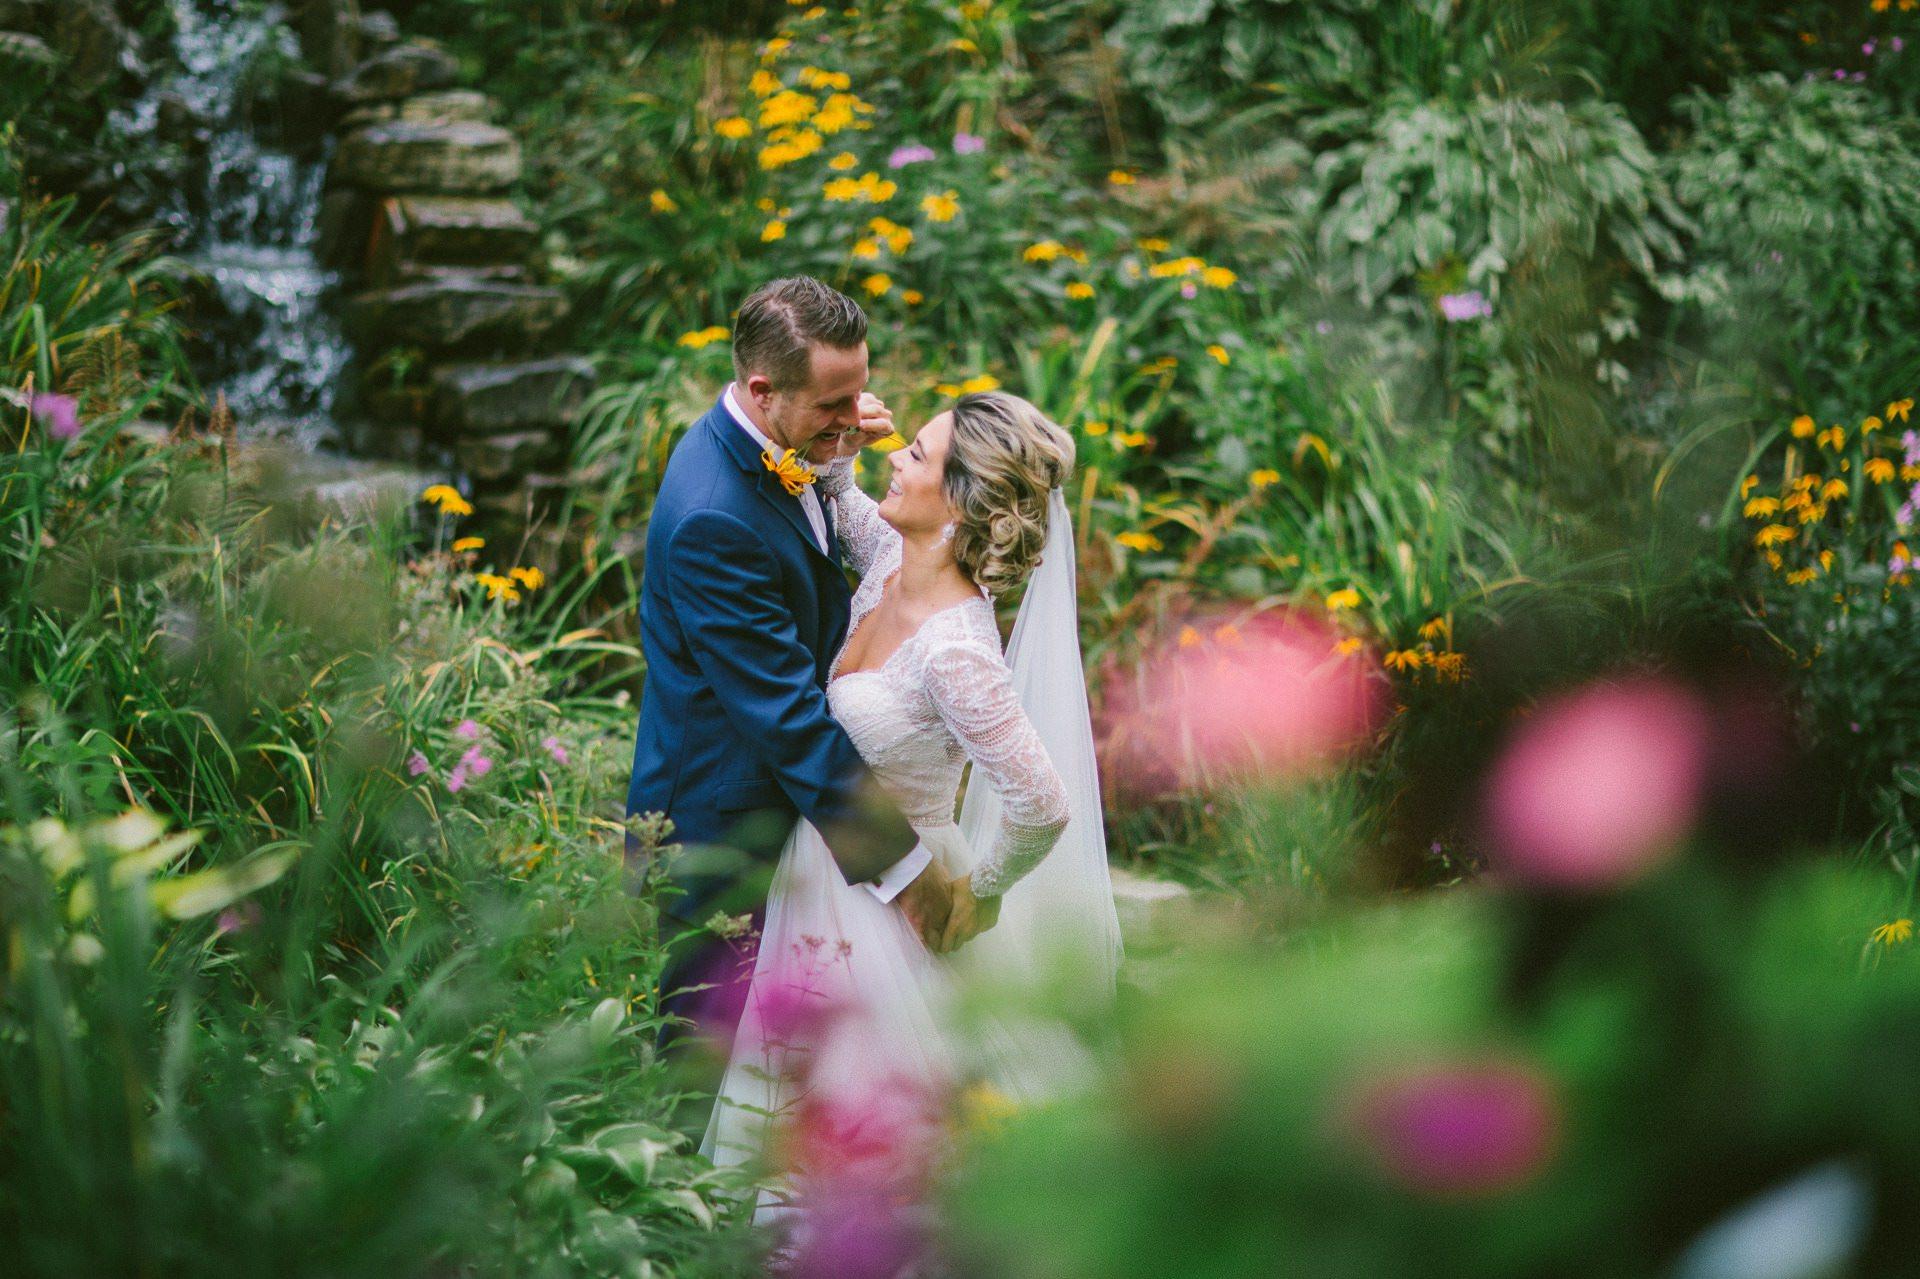 Meadow Ridge Farm Wedding Photos in Windsor 1 29.jpg